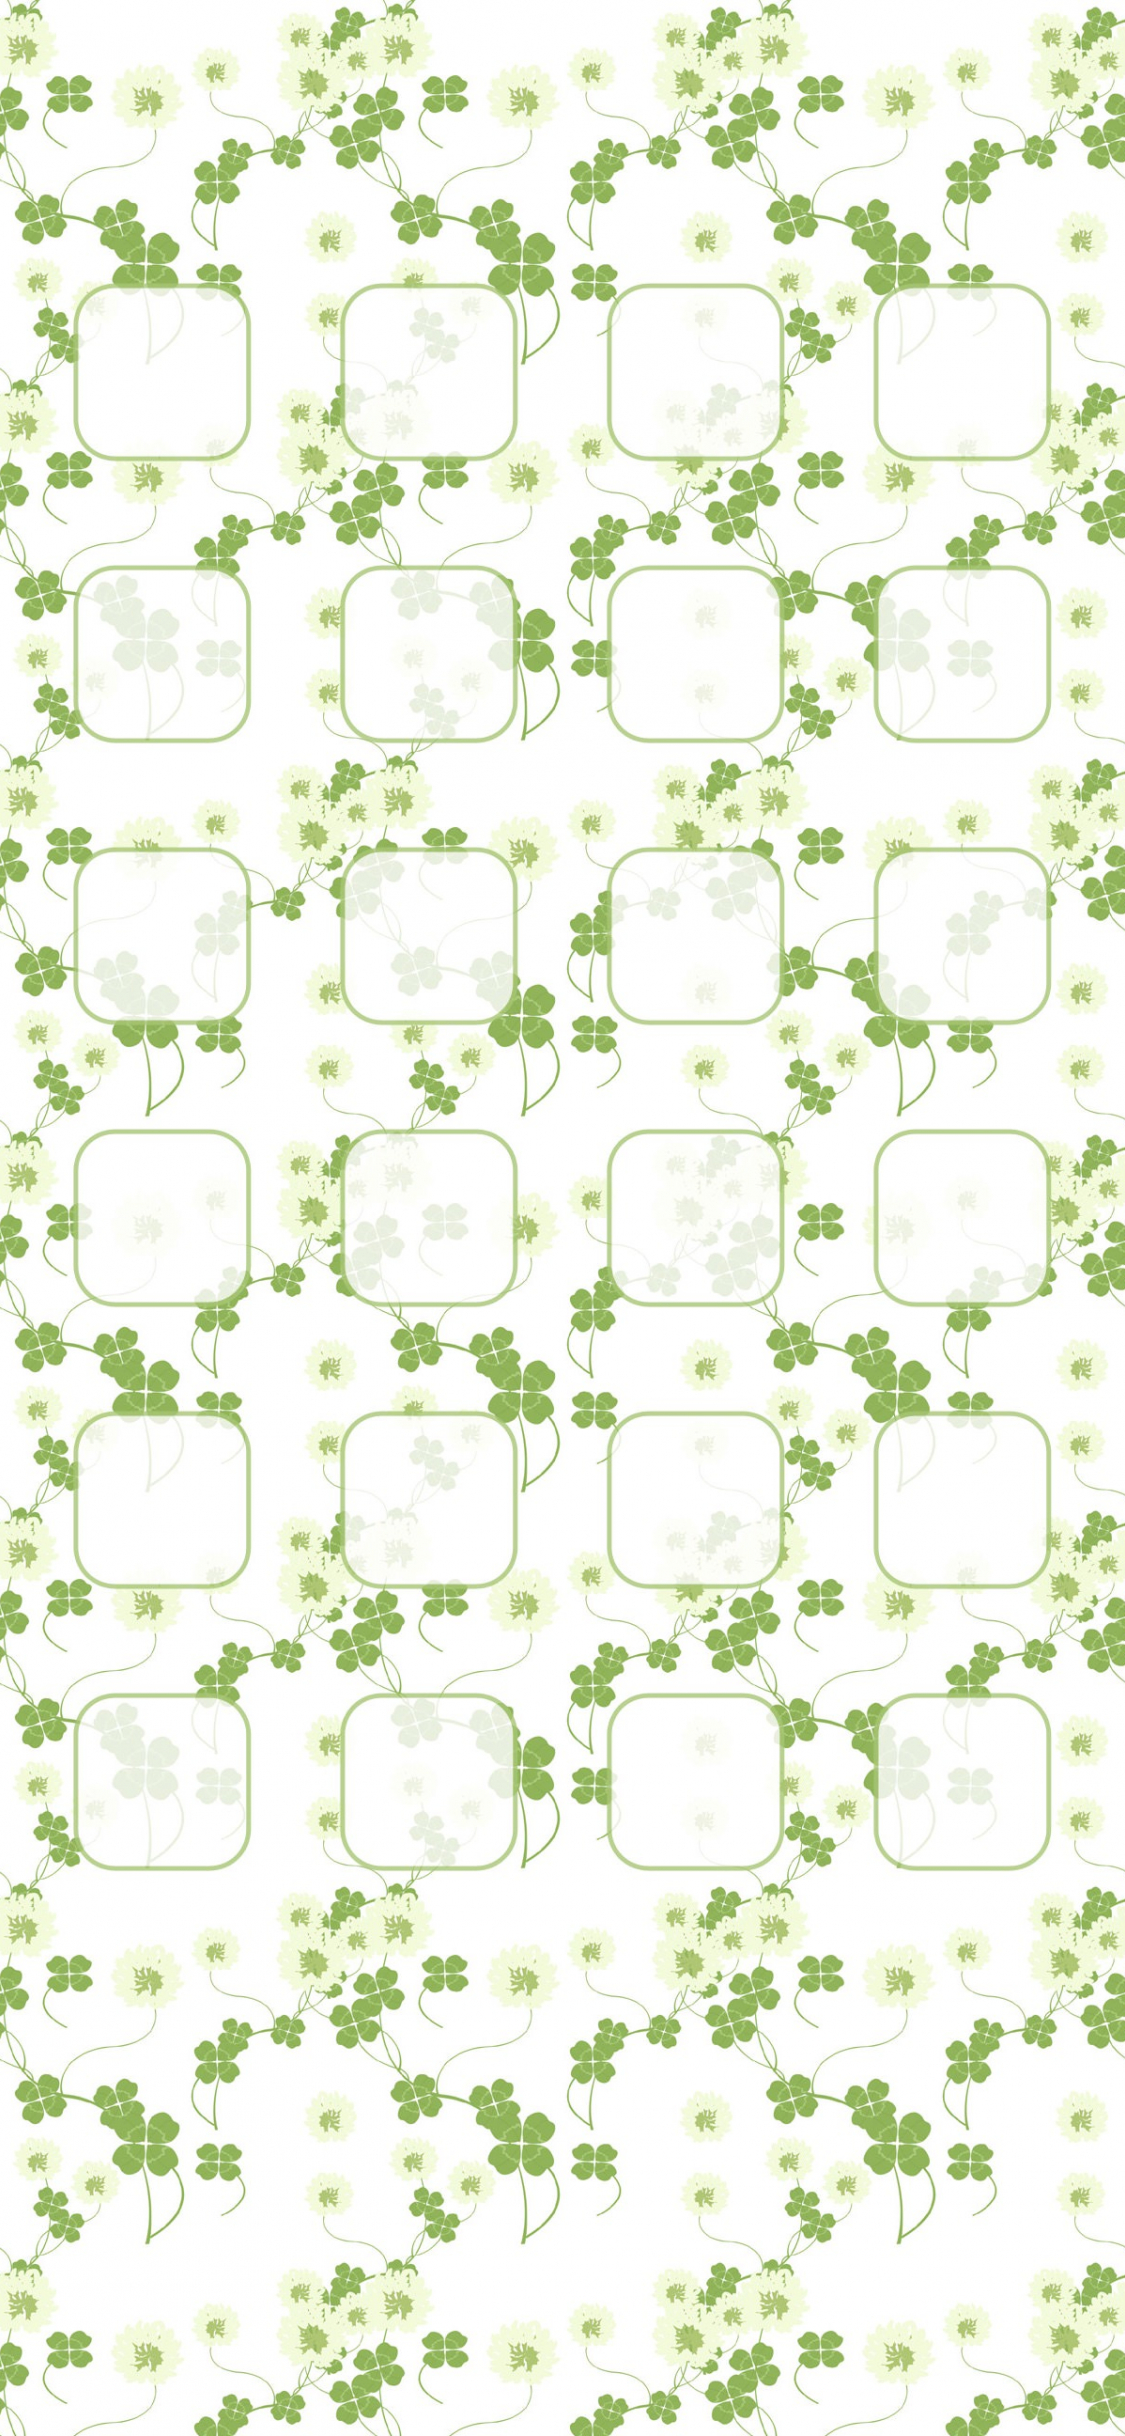 Free Download Clover Pattern Illustrations Green Shelf Wallpapersc